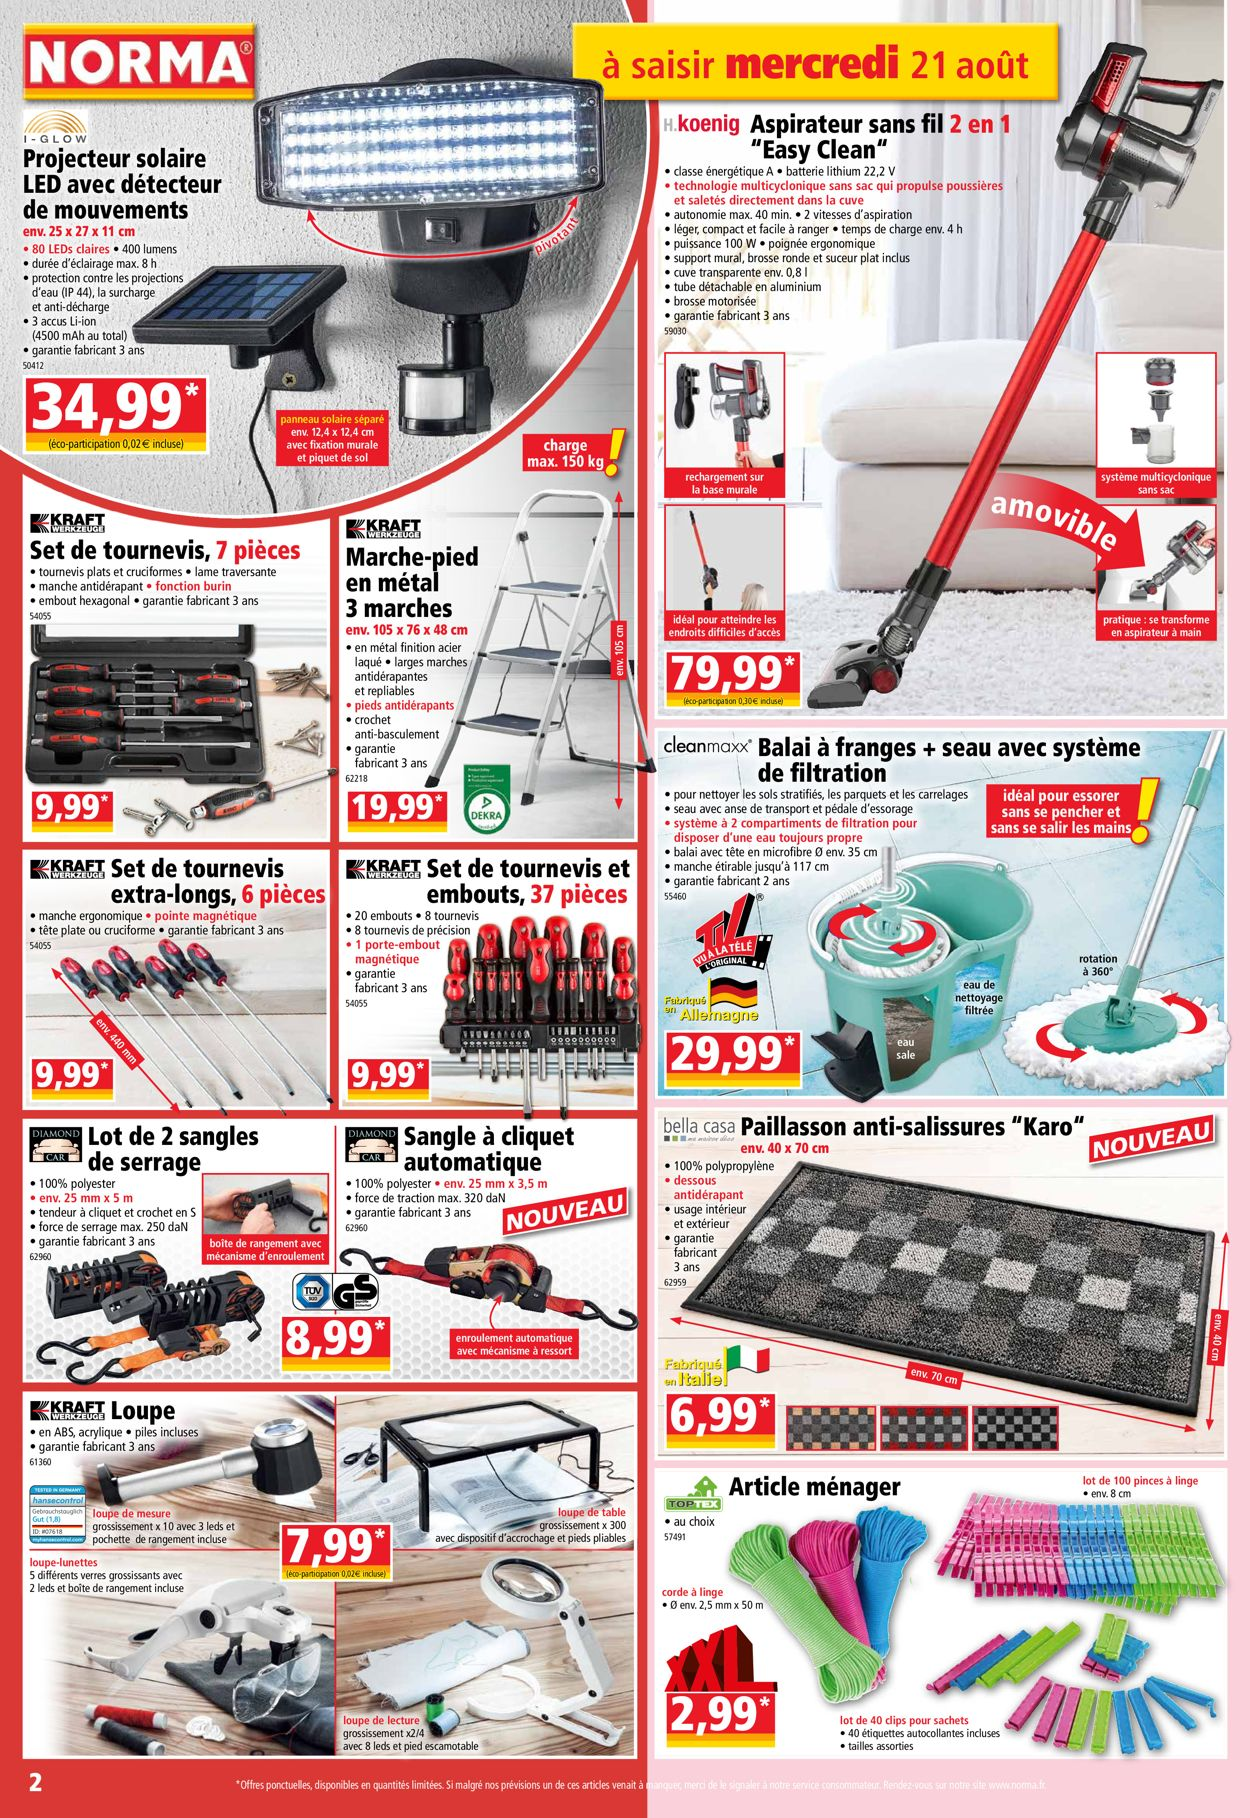 Norma Catalogue - 21.08-27.08.2019 (Page 2)